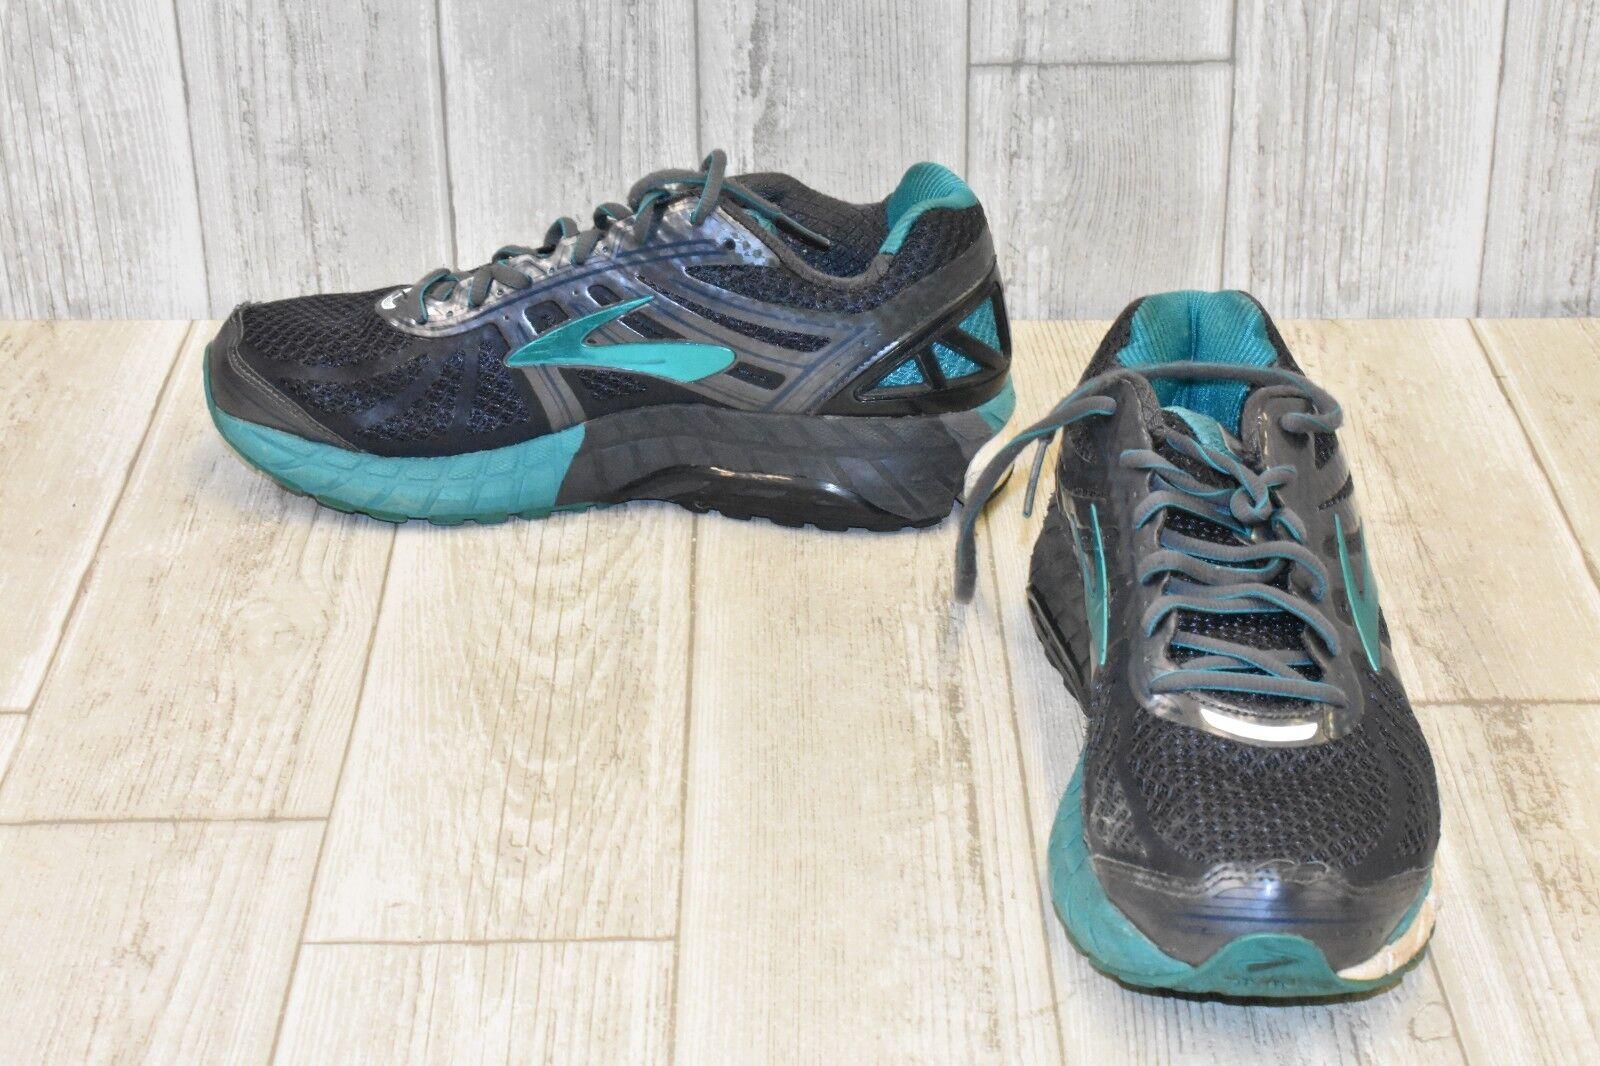 Brooks Ariel Running shoes-Women's size 11 Navy